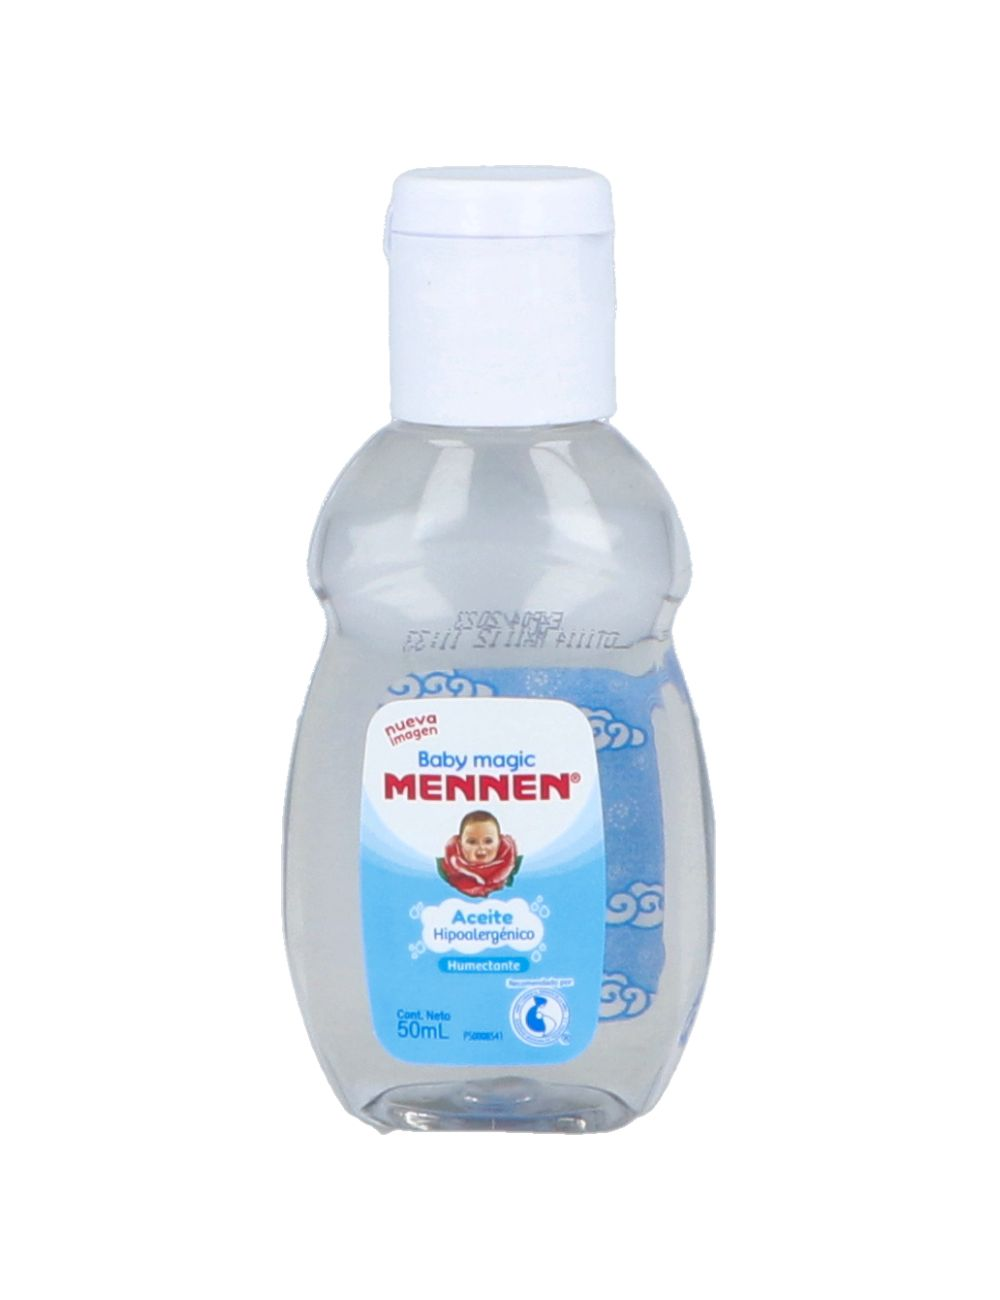 Baby Magic Mennen Aceite 50mL Botella Con 50mL